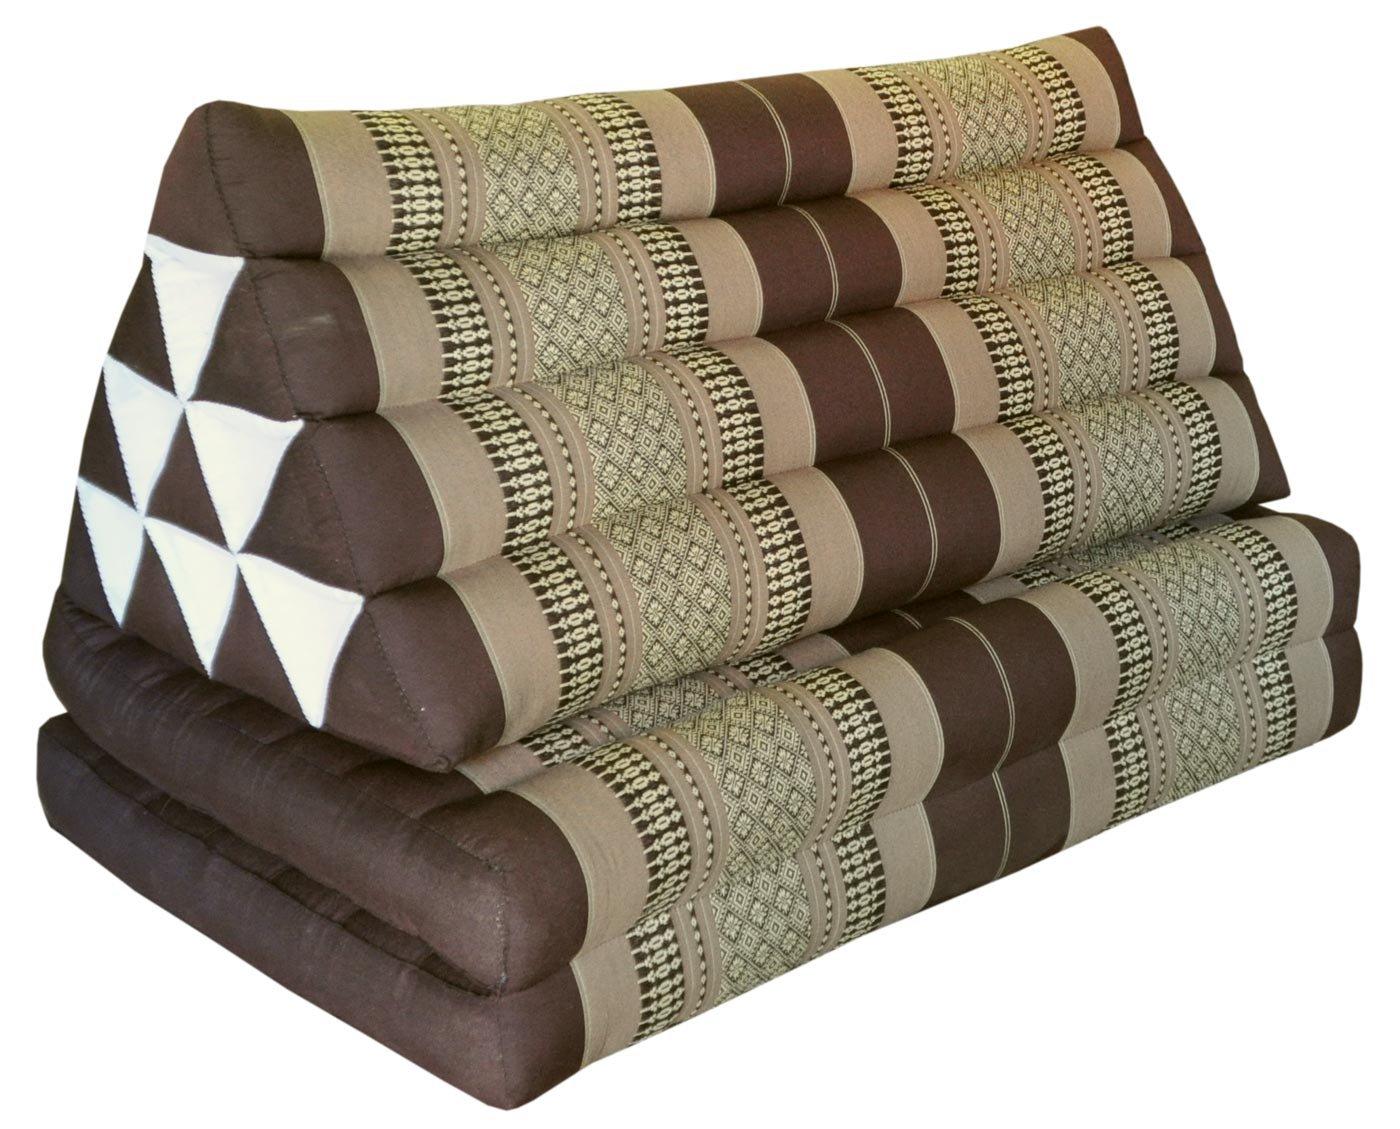 Thai triangle cushion XXL, with 2 folding seats, brown, sofa, relaxation, beach, pool, meditation, yoga, made in Thailand. (82417)